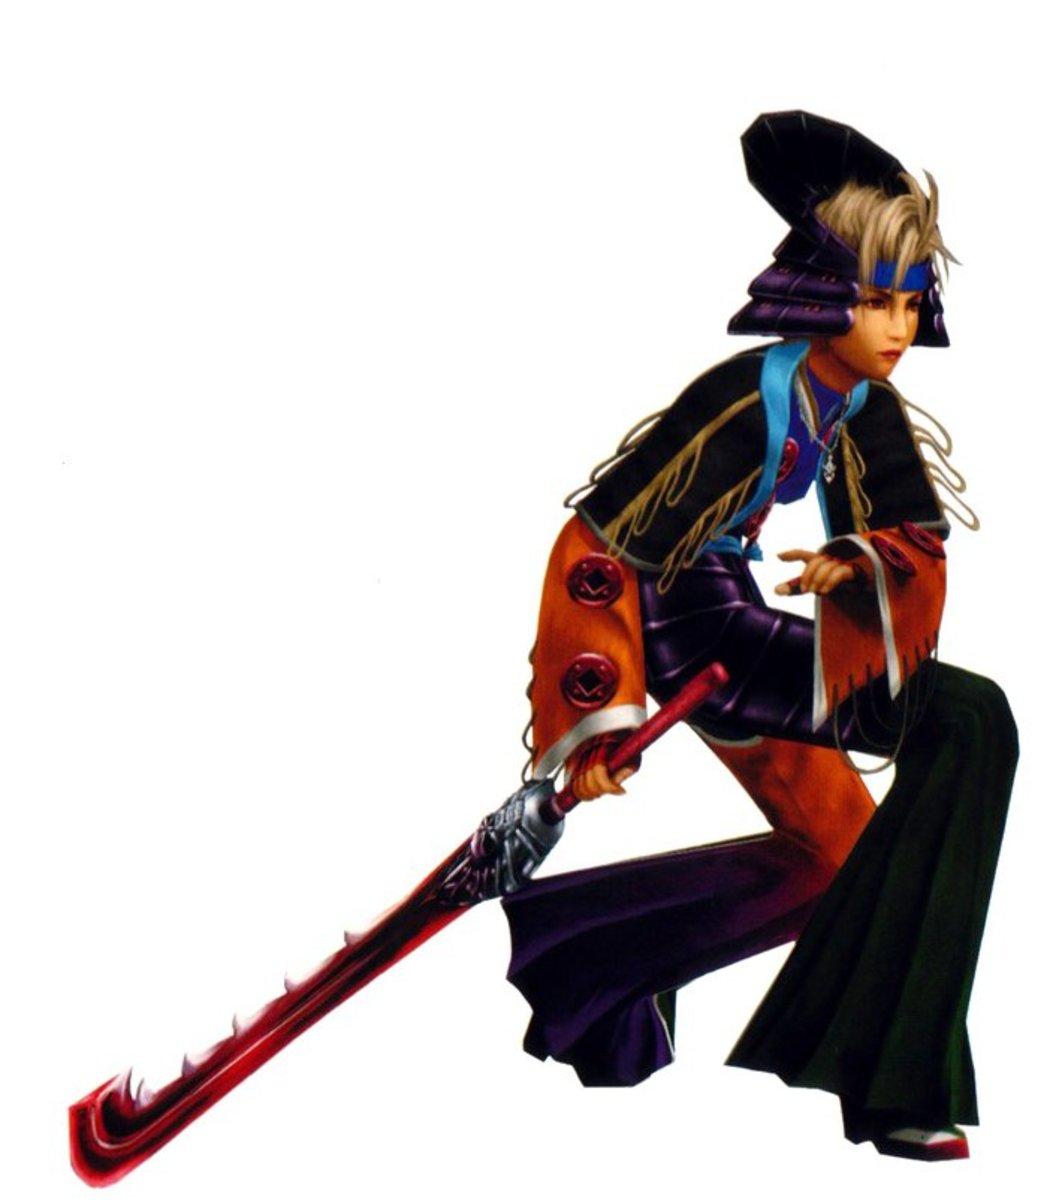 Paine as a Samurai